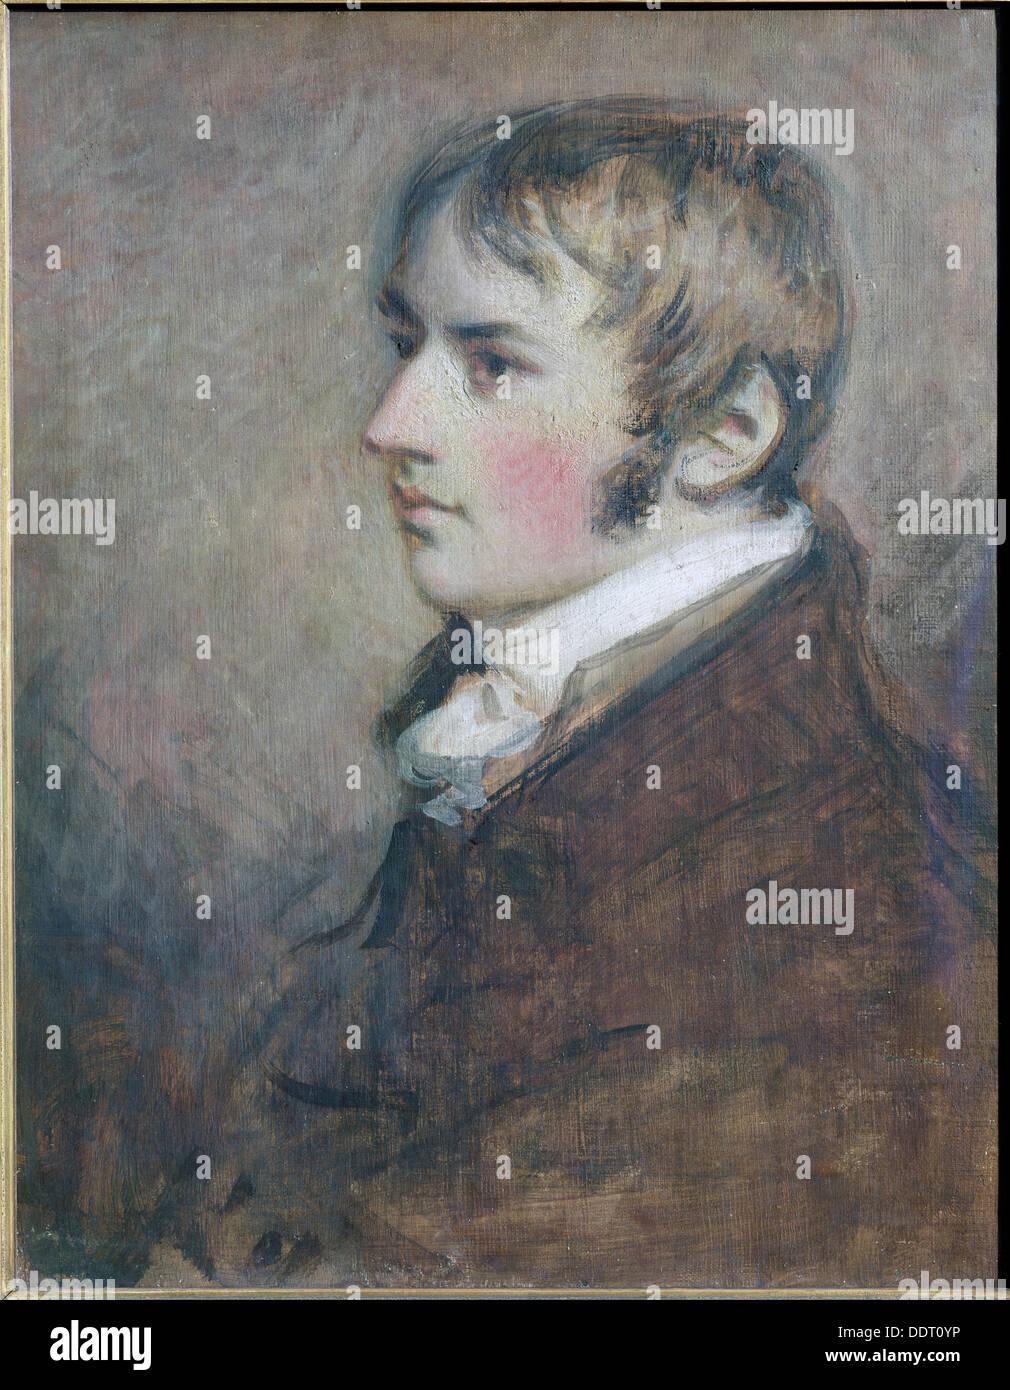 John Constable, English landscape painter, 1796. Artist: Daniel Gardner Stock Photo